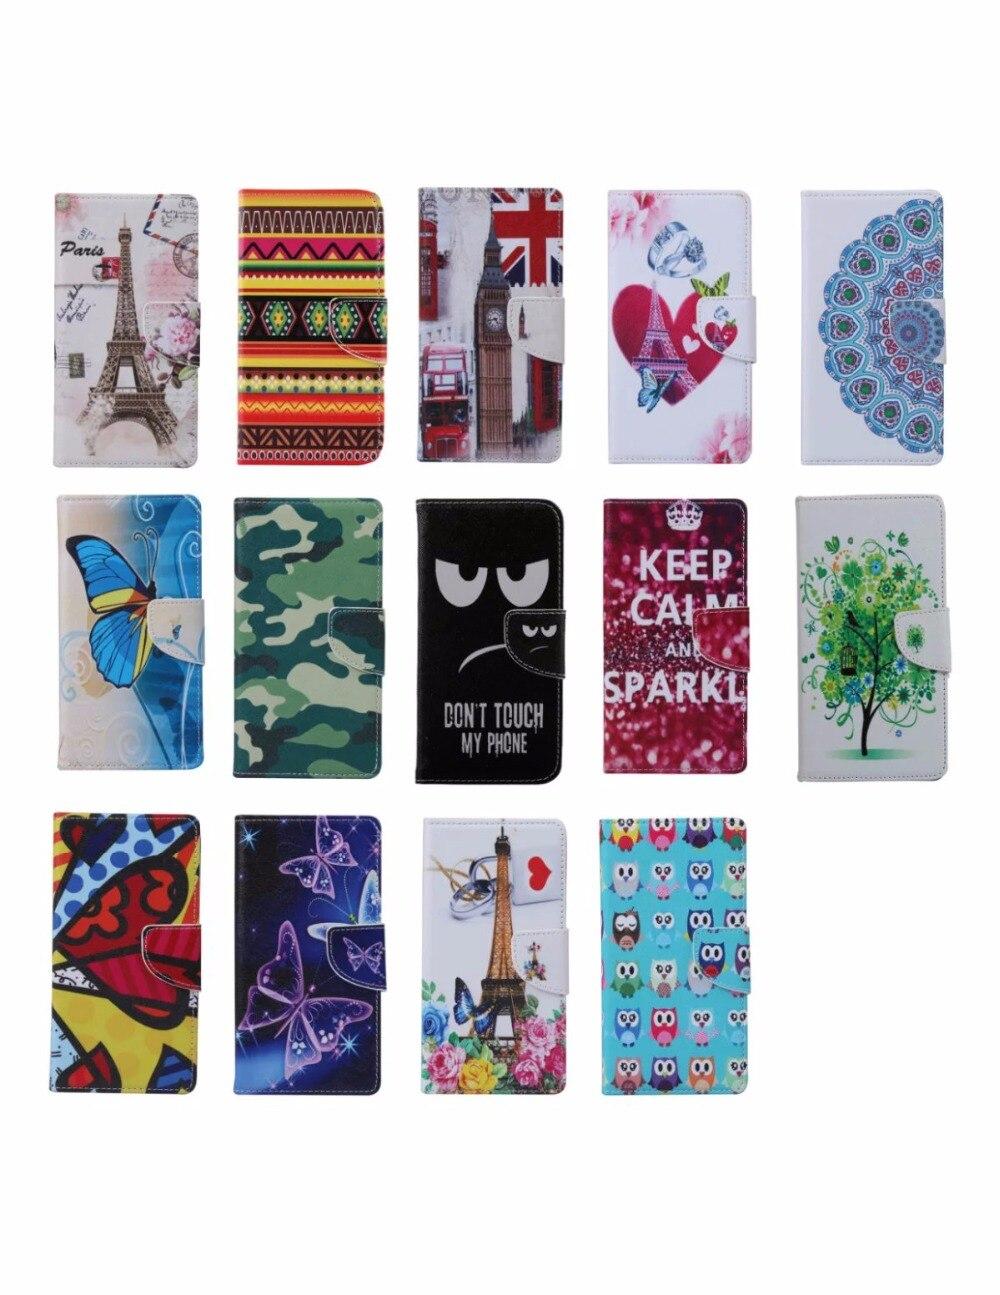 50pcs/lot Brand New Cute Cartoon animal print owl monkey tower wallet for Samsung Galaxy A3 2016